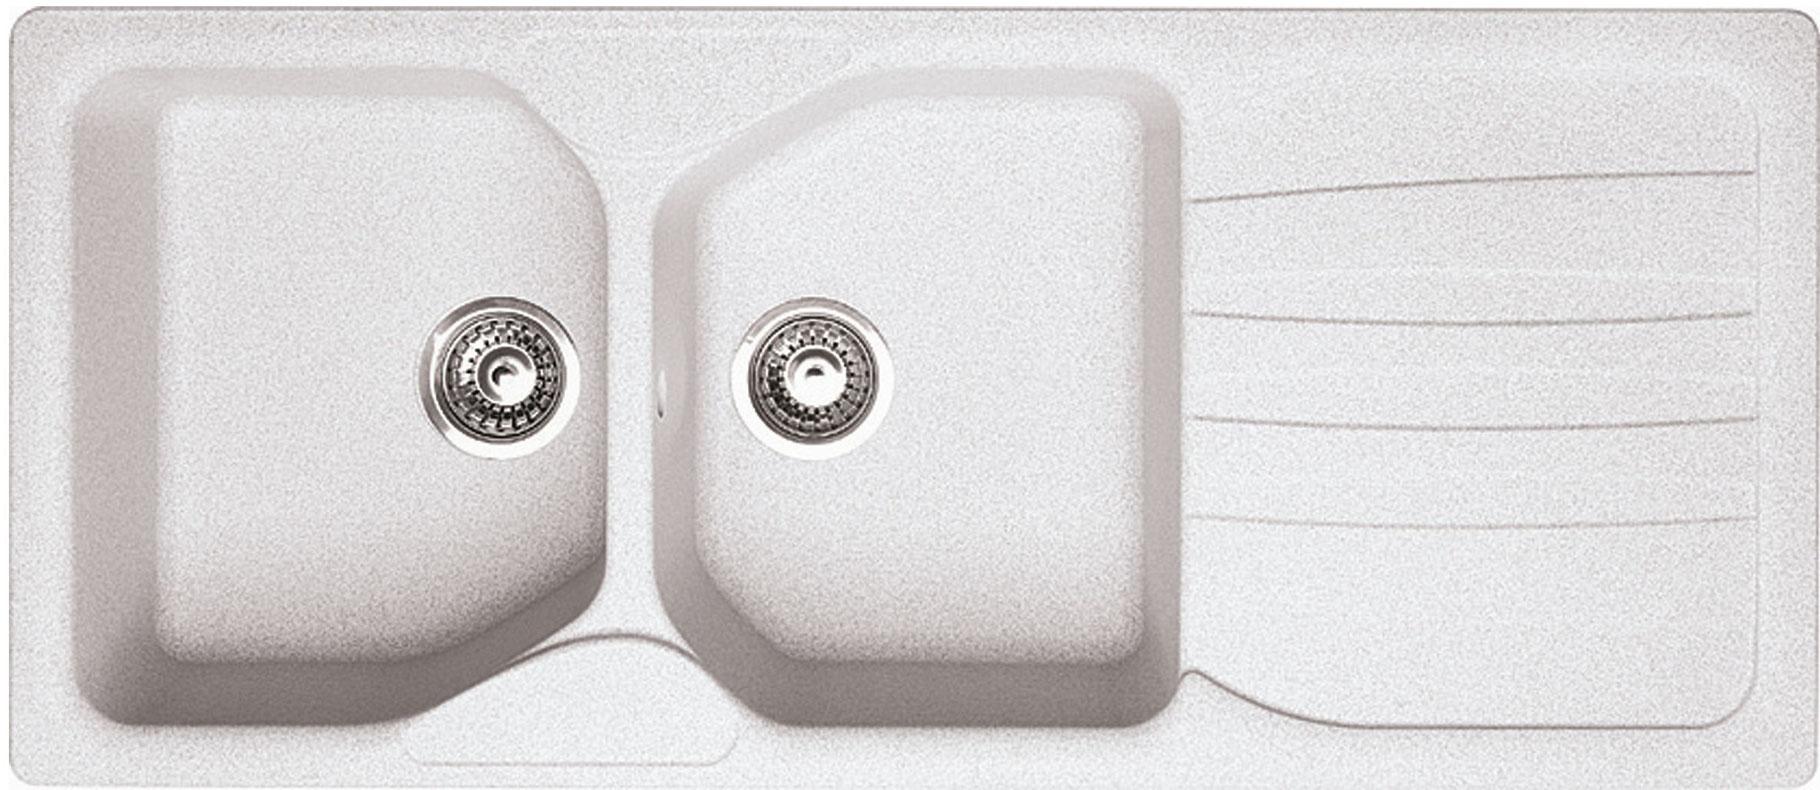 Lavandino Franke Fragranite Bianco.Lavelli Sintetici Benvenuti Su Ilangeweb Outlet Miscelatori